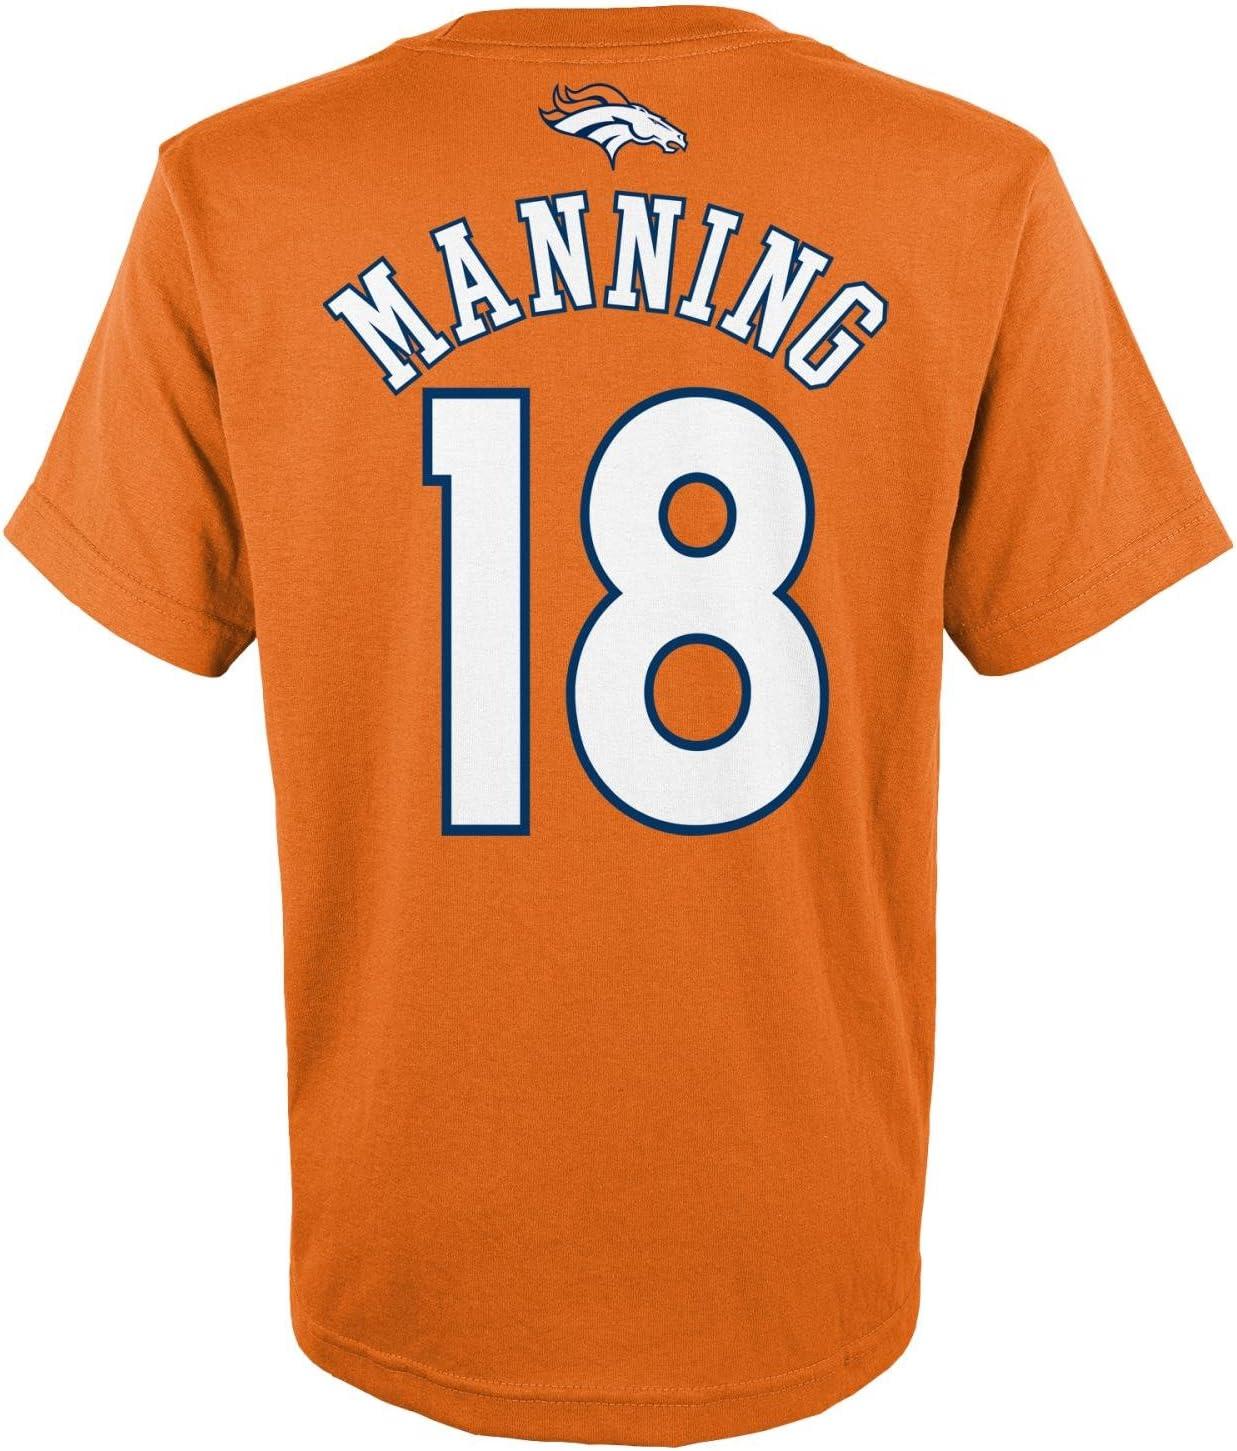 SCHUANG #18 Peyton Manning Rugby Jersey American Football Jersey Denver Broncos 18# Men Embroidered Tops Short Sleeve Shirt Sport T-Shirt Sweatshirt